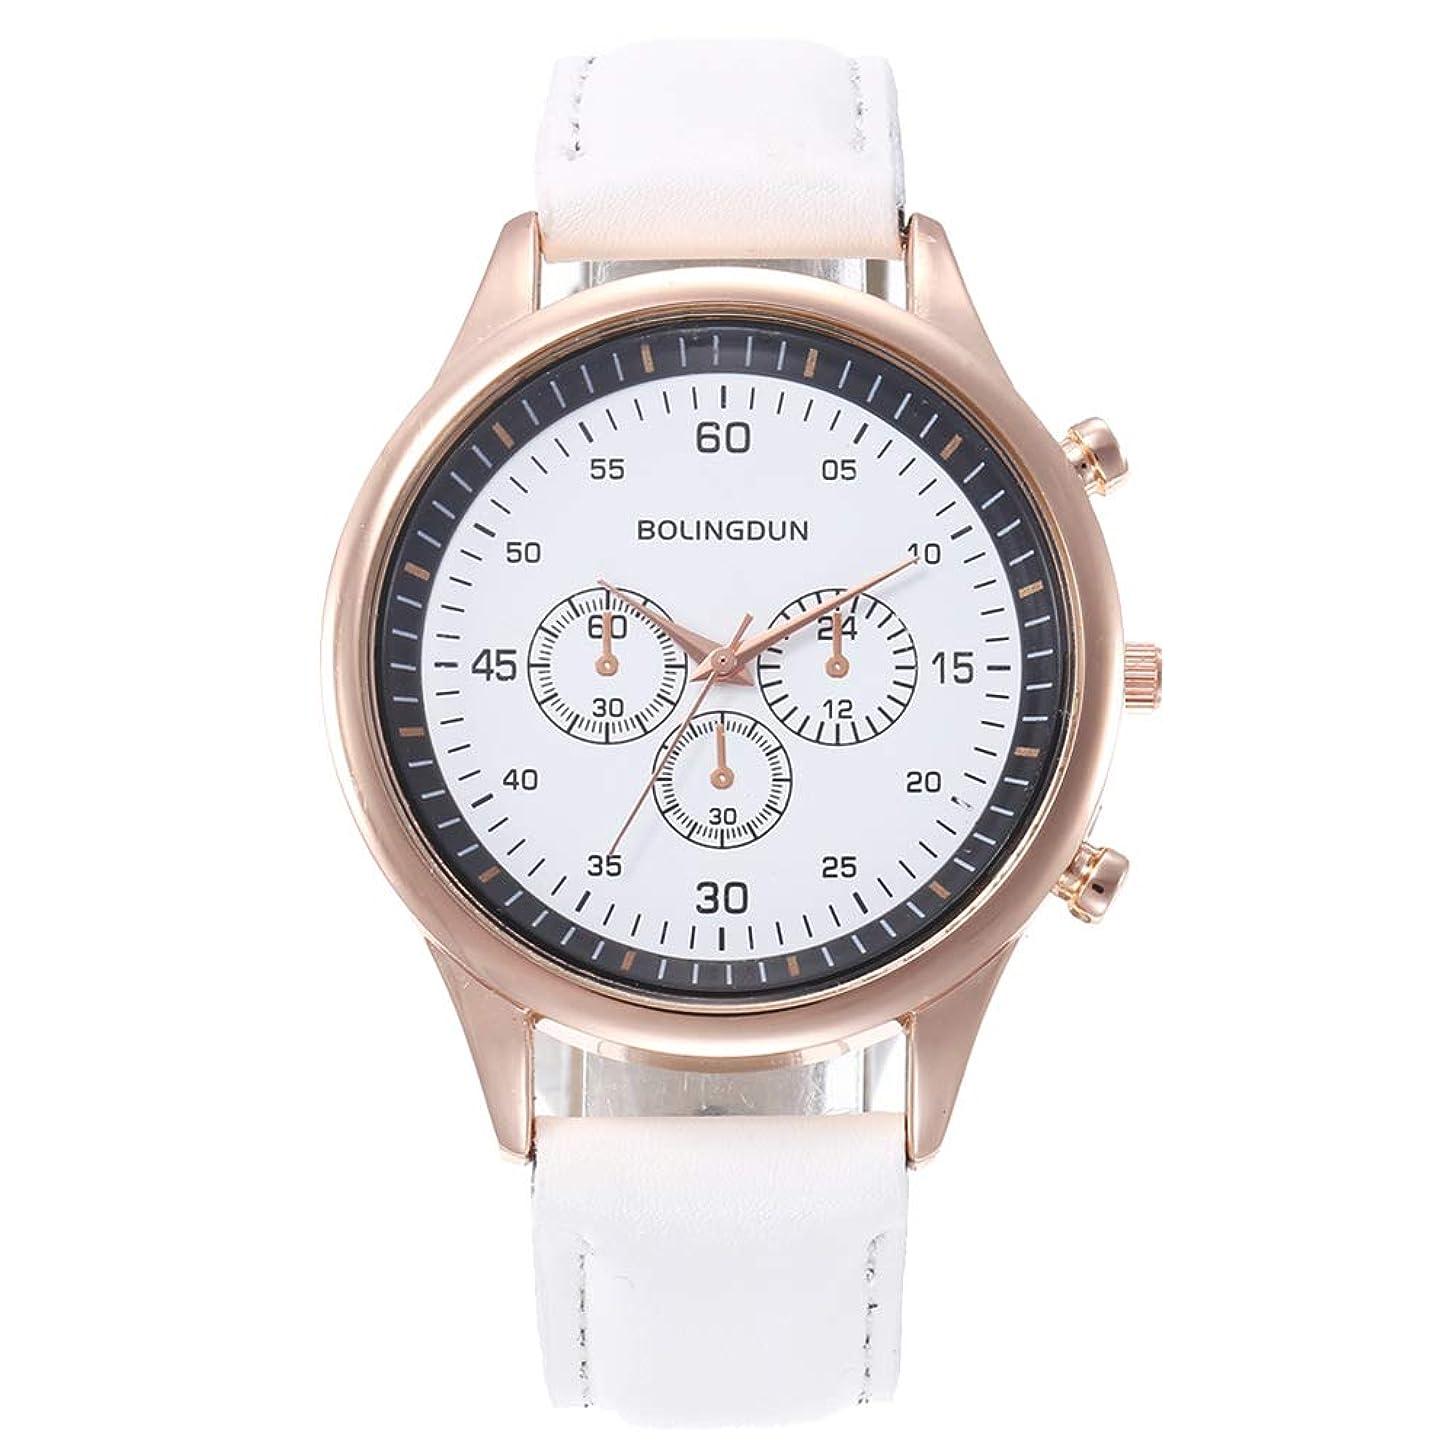 lightclub Business Men Sub-dial Decor Round Dial Faux Leather Band Quartz Wrist Watch for Women Men White